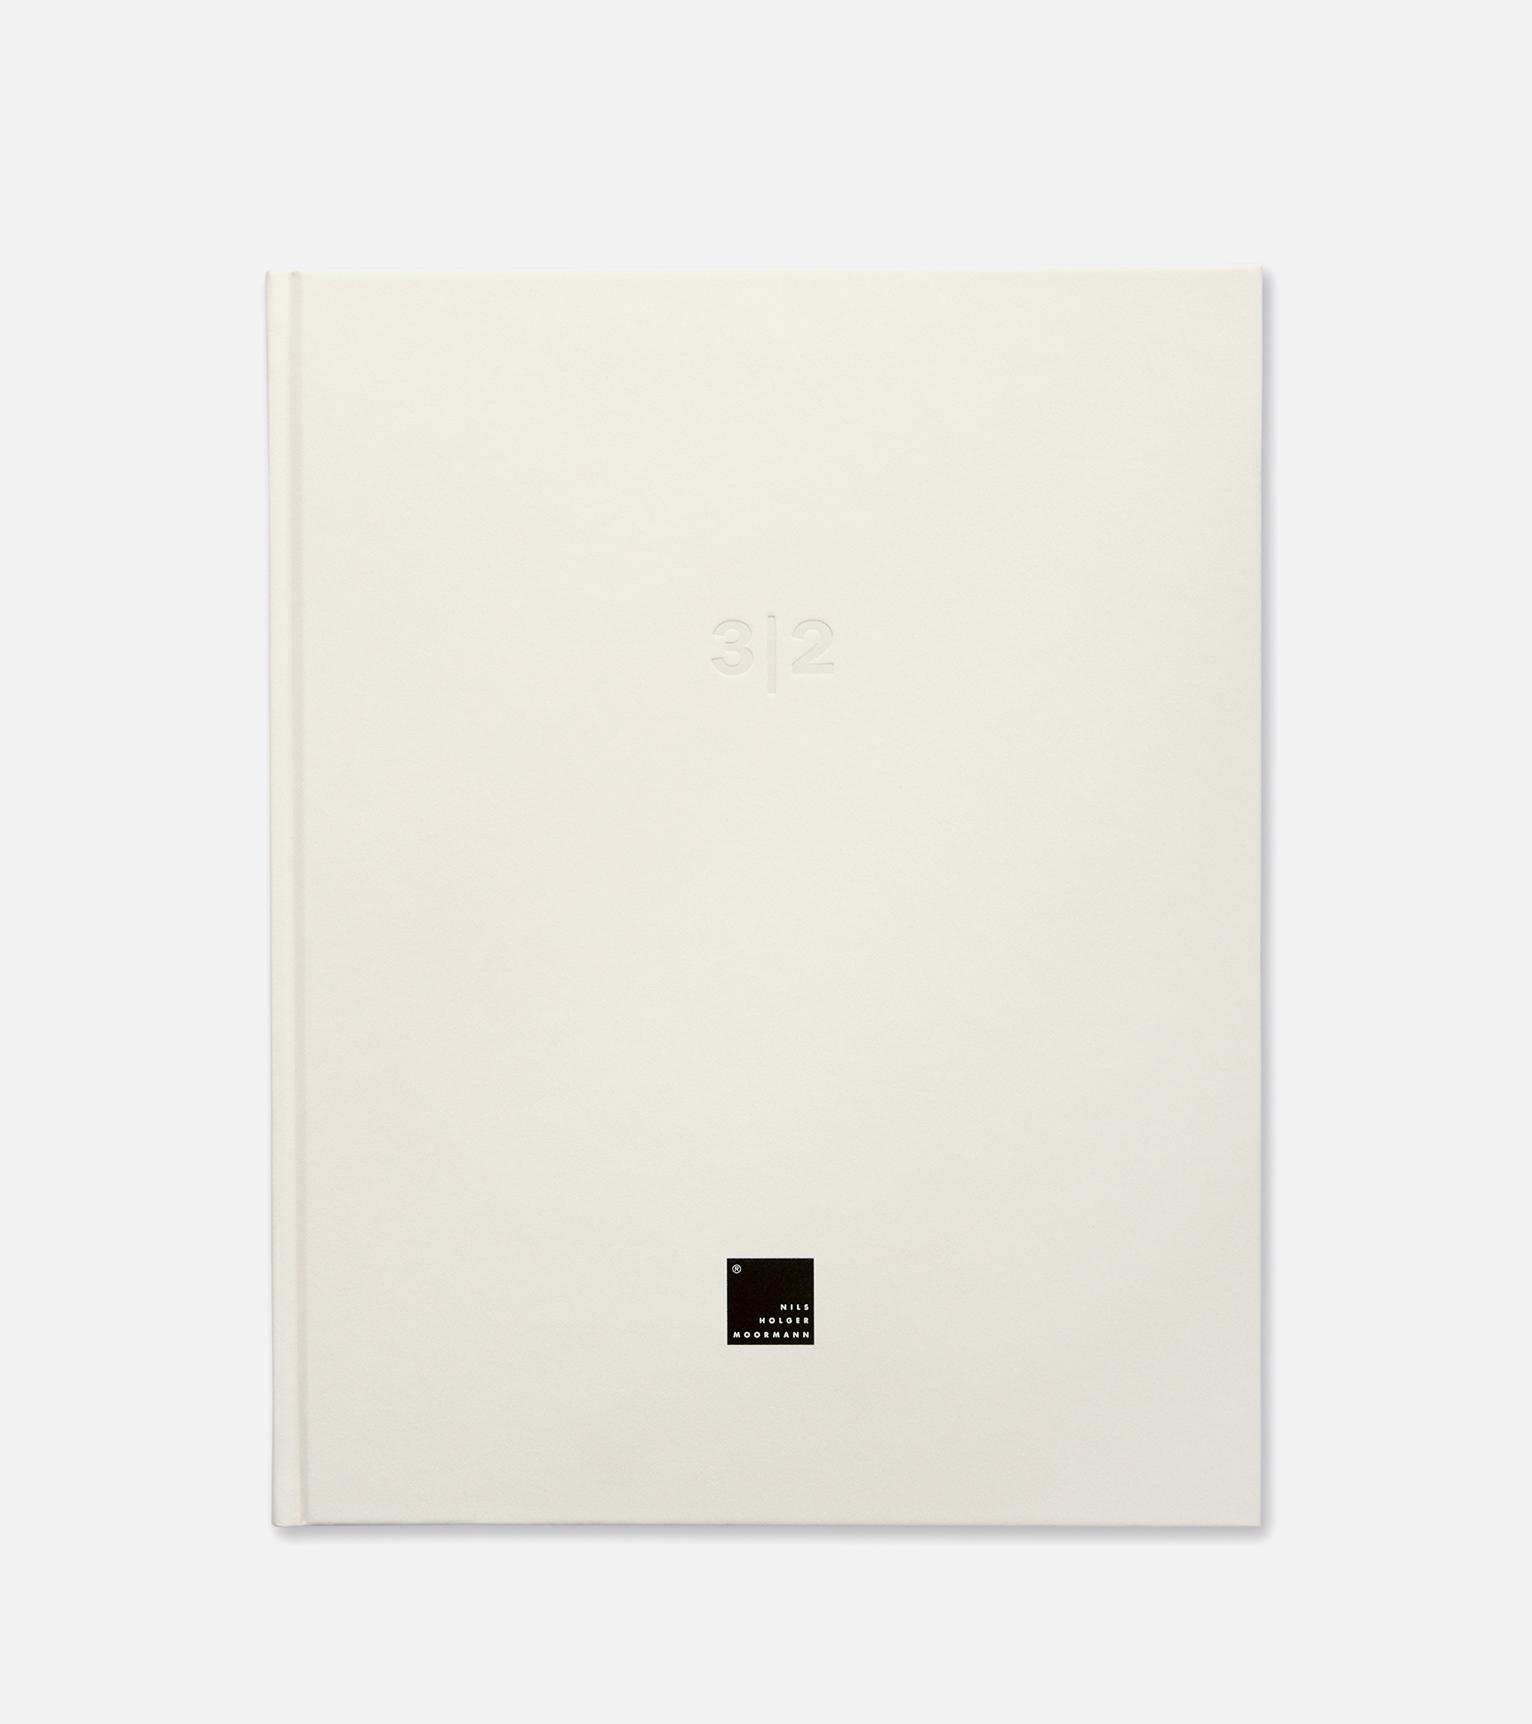 Moormann-Katalog-3-2